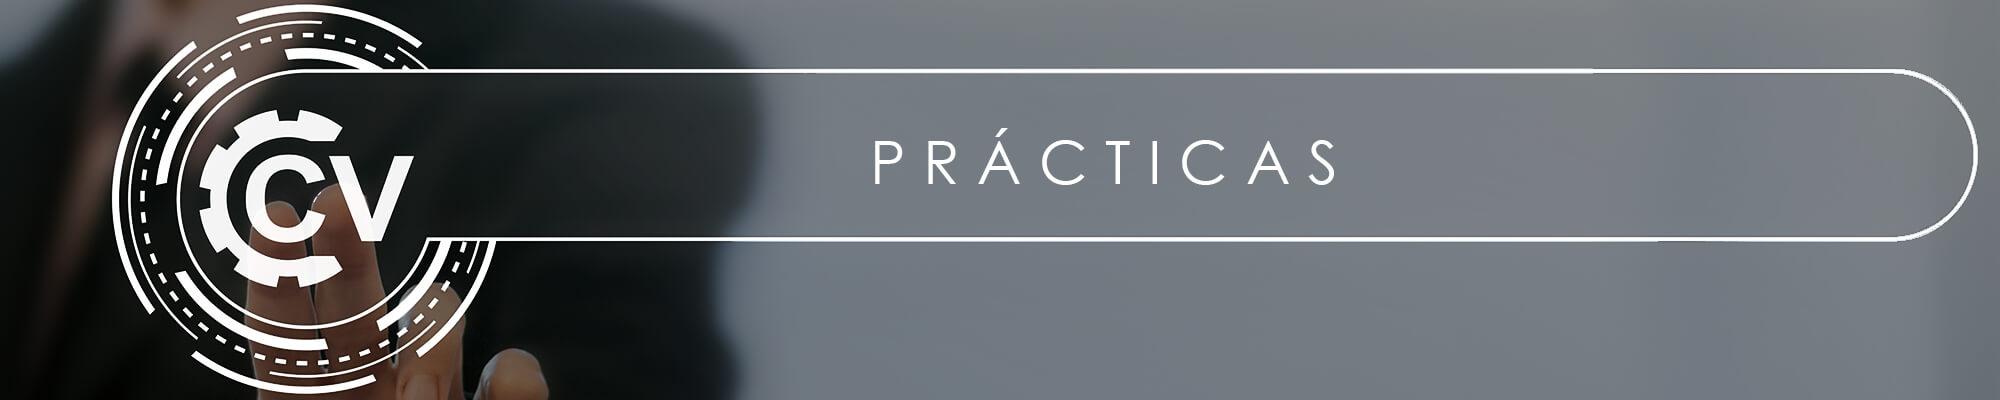 slide-practicas